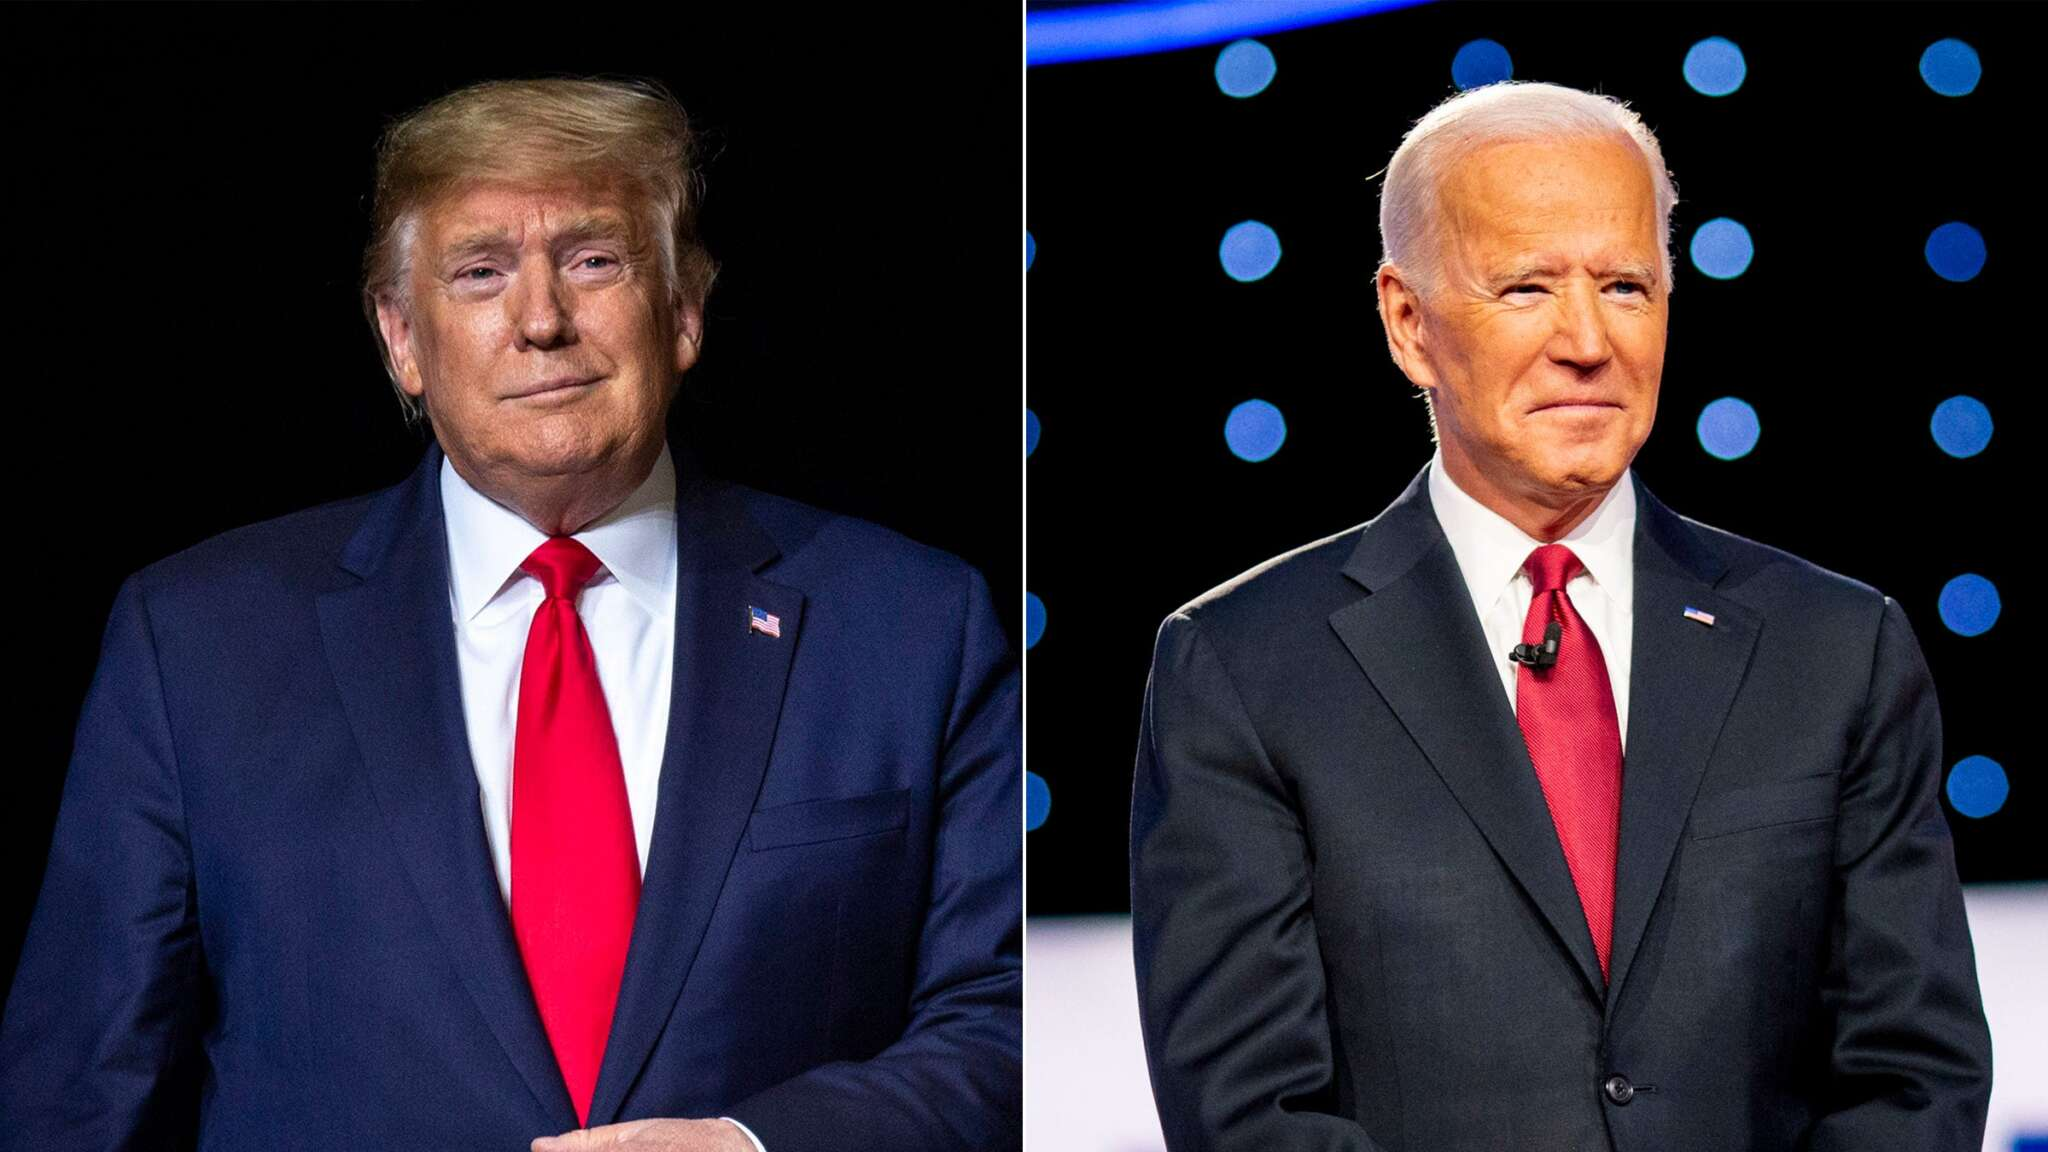 Donald Trump Says He Won't Be At Joe Biden's Inauguration